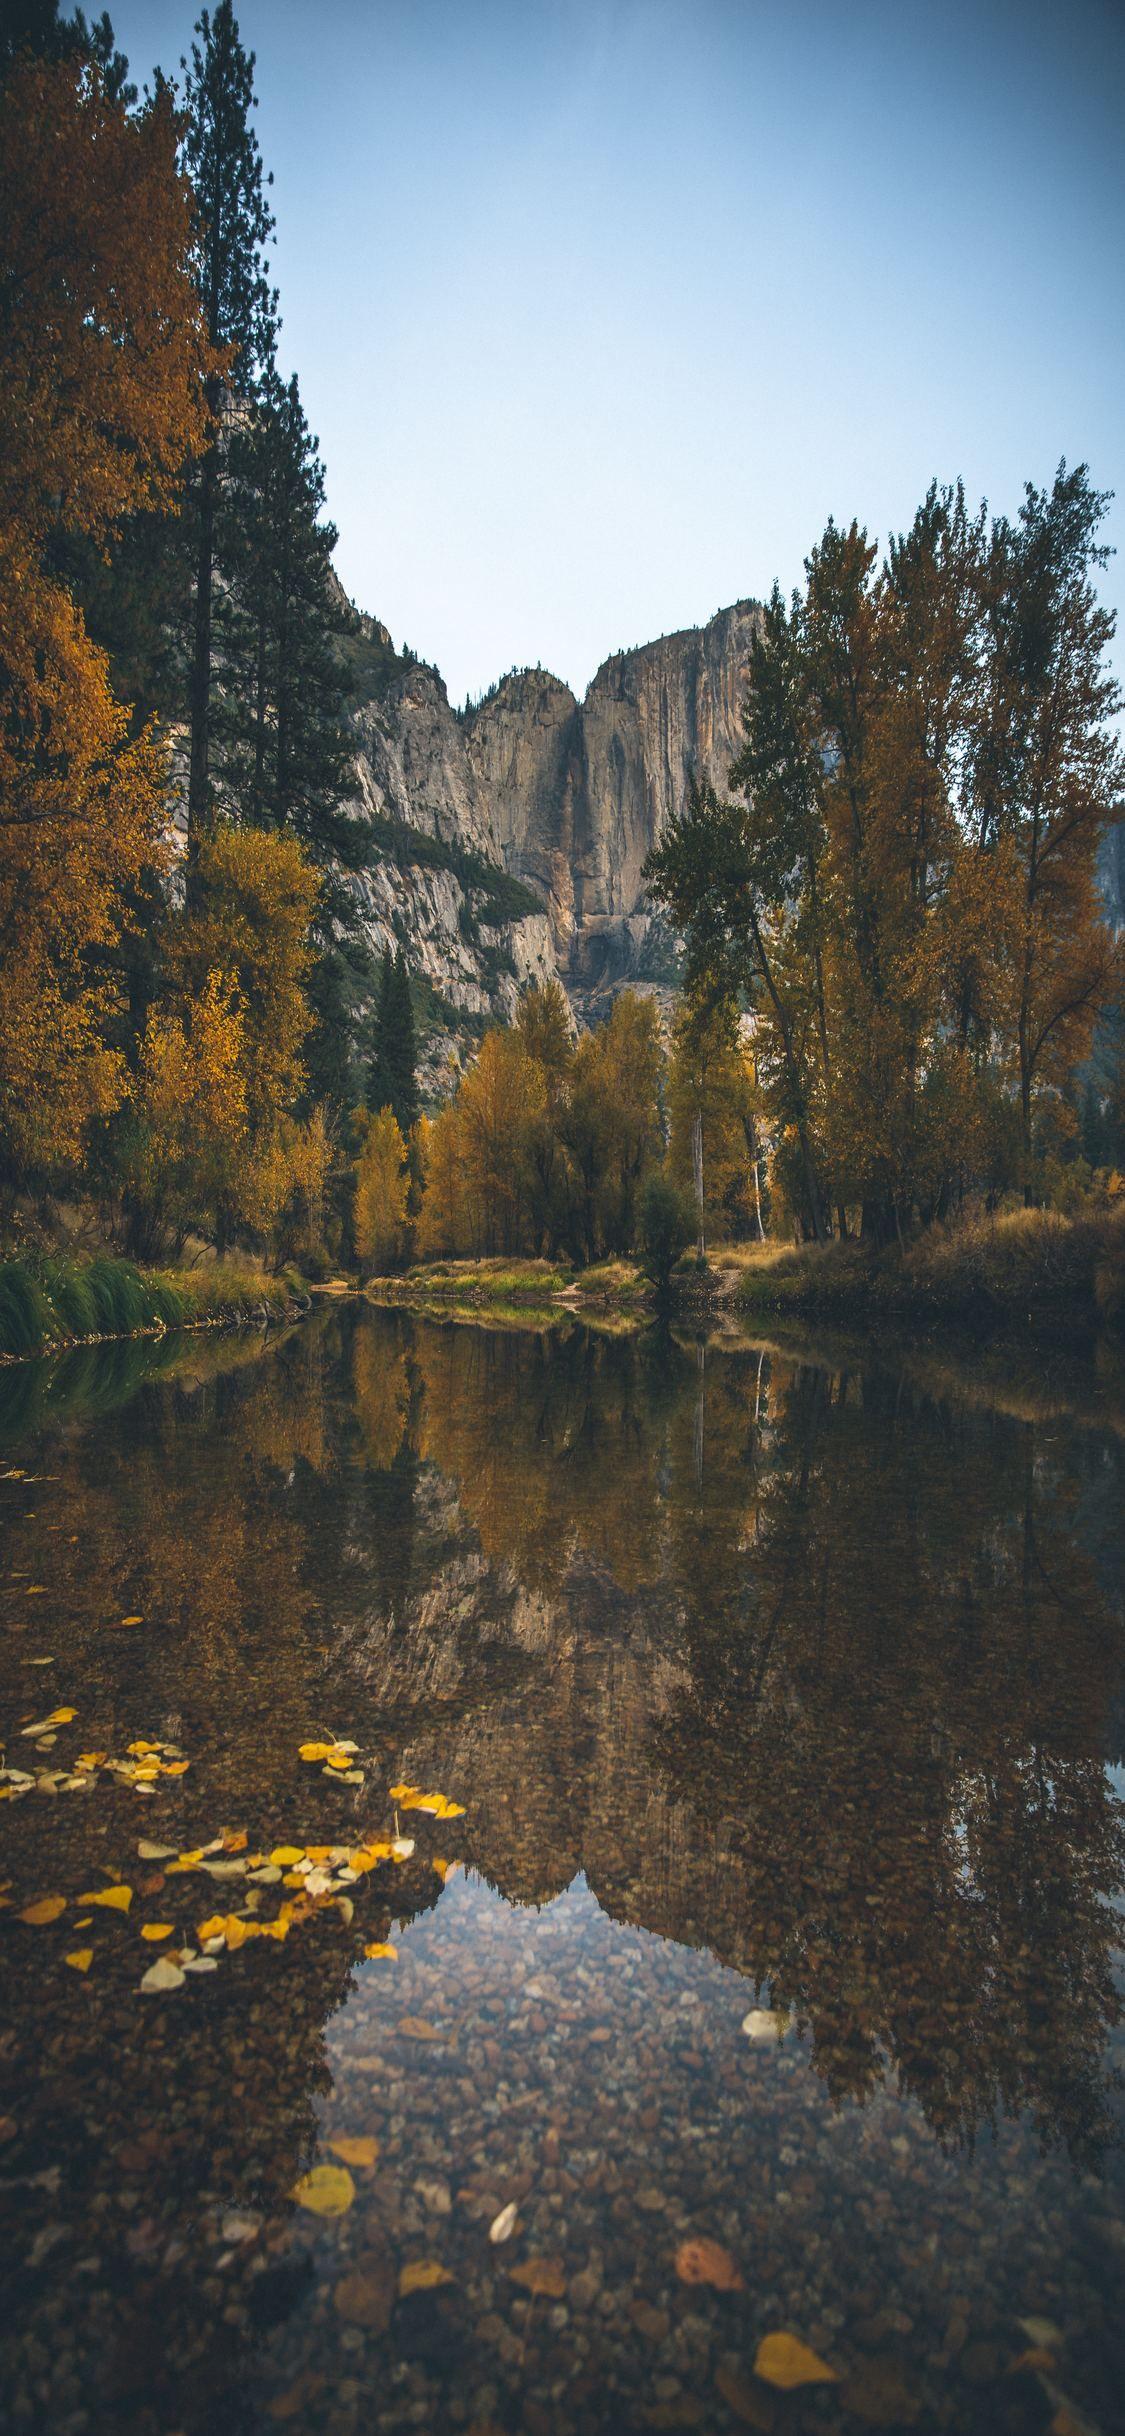 Best Aesthetic Wallpaper Landscapes Hd Aesthetic Wallpaper Landscape Wallpaper Landscape Photo